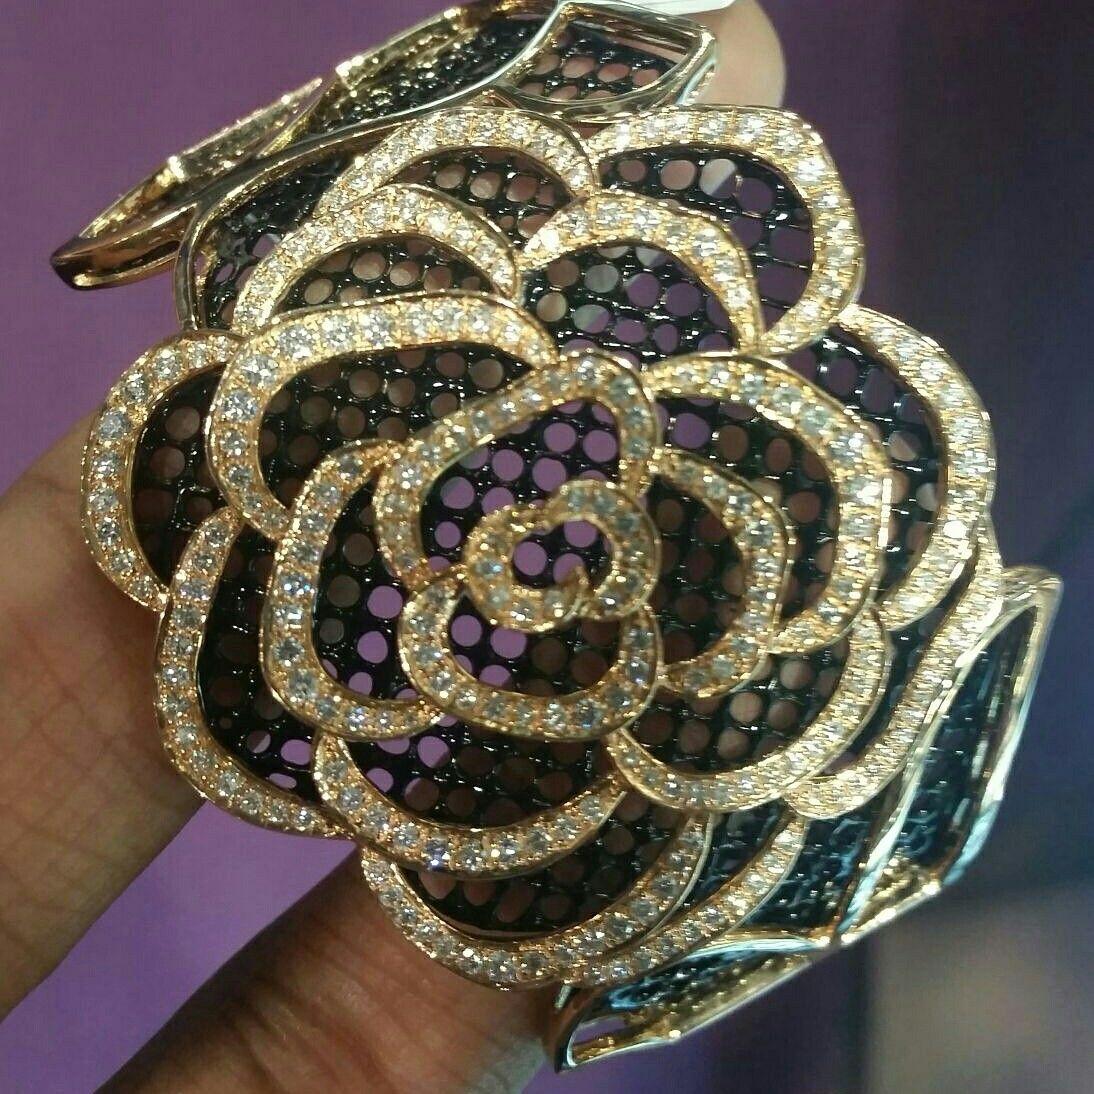 Aksharchoudreefinejewellery design inspired by roses black rose